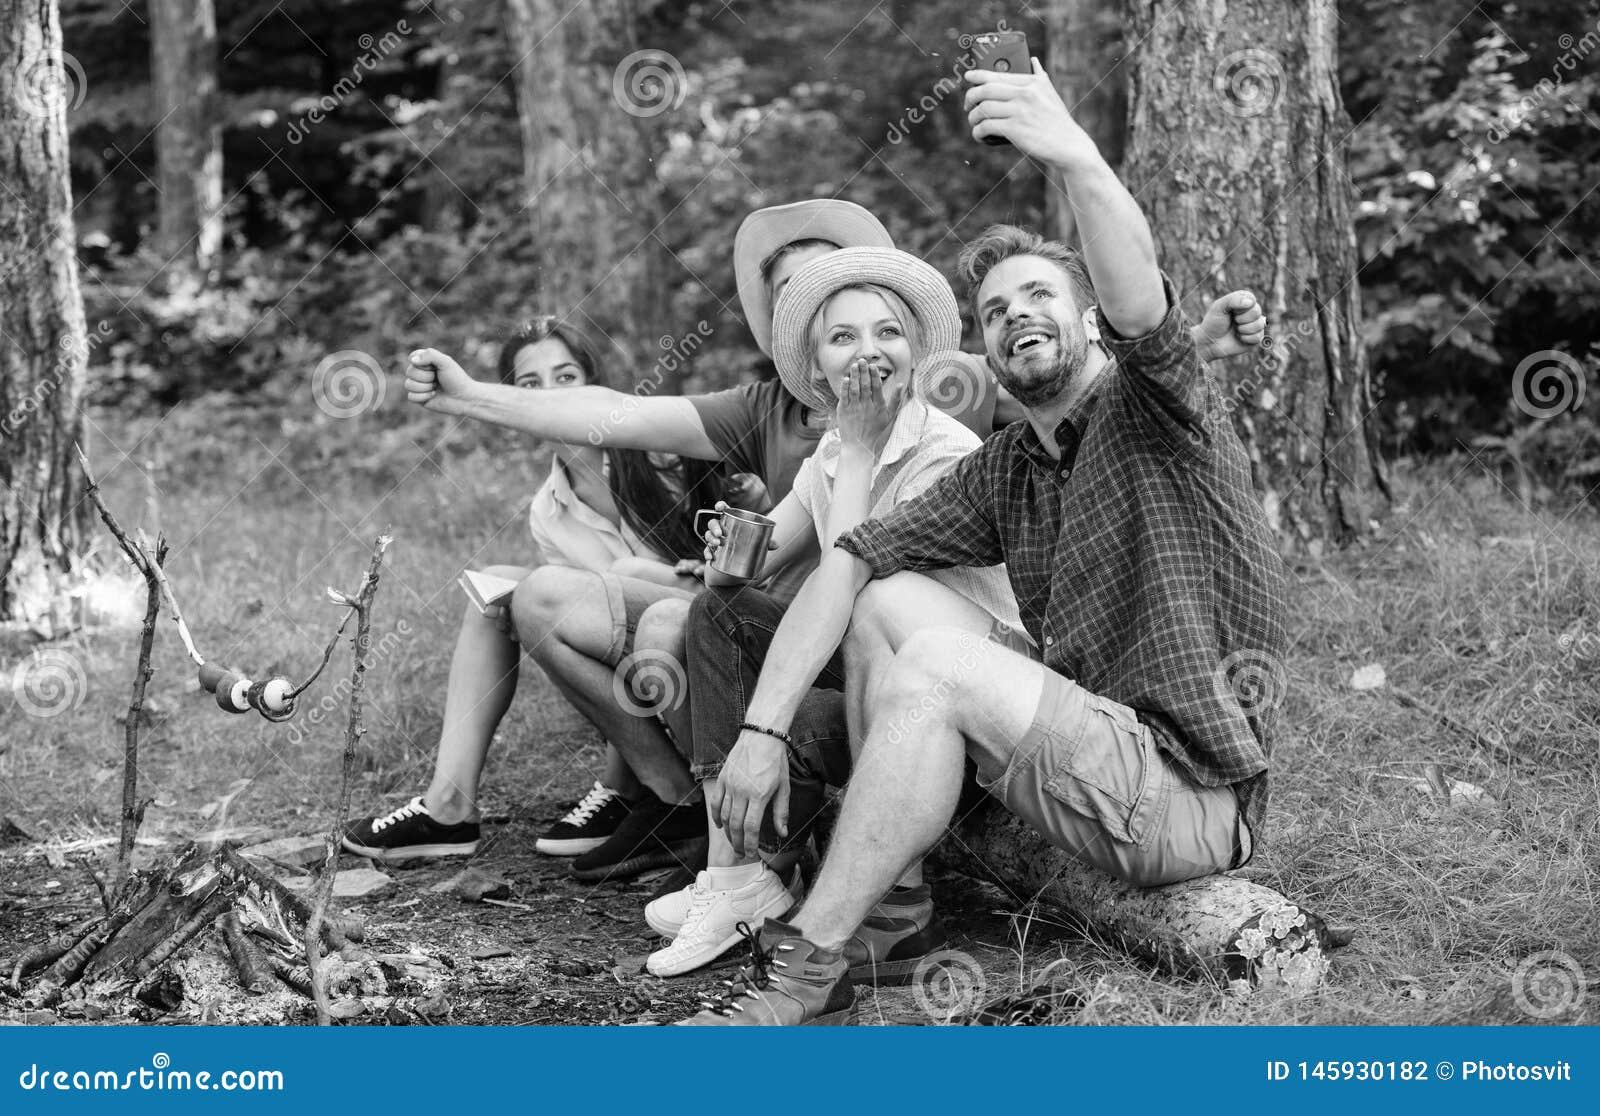 Friends near bonfire enjoy vacation and roasted food. Tourists sit log near bonfire taking selfie photo smartphone